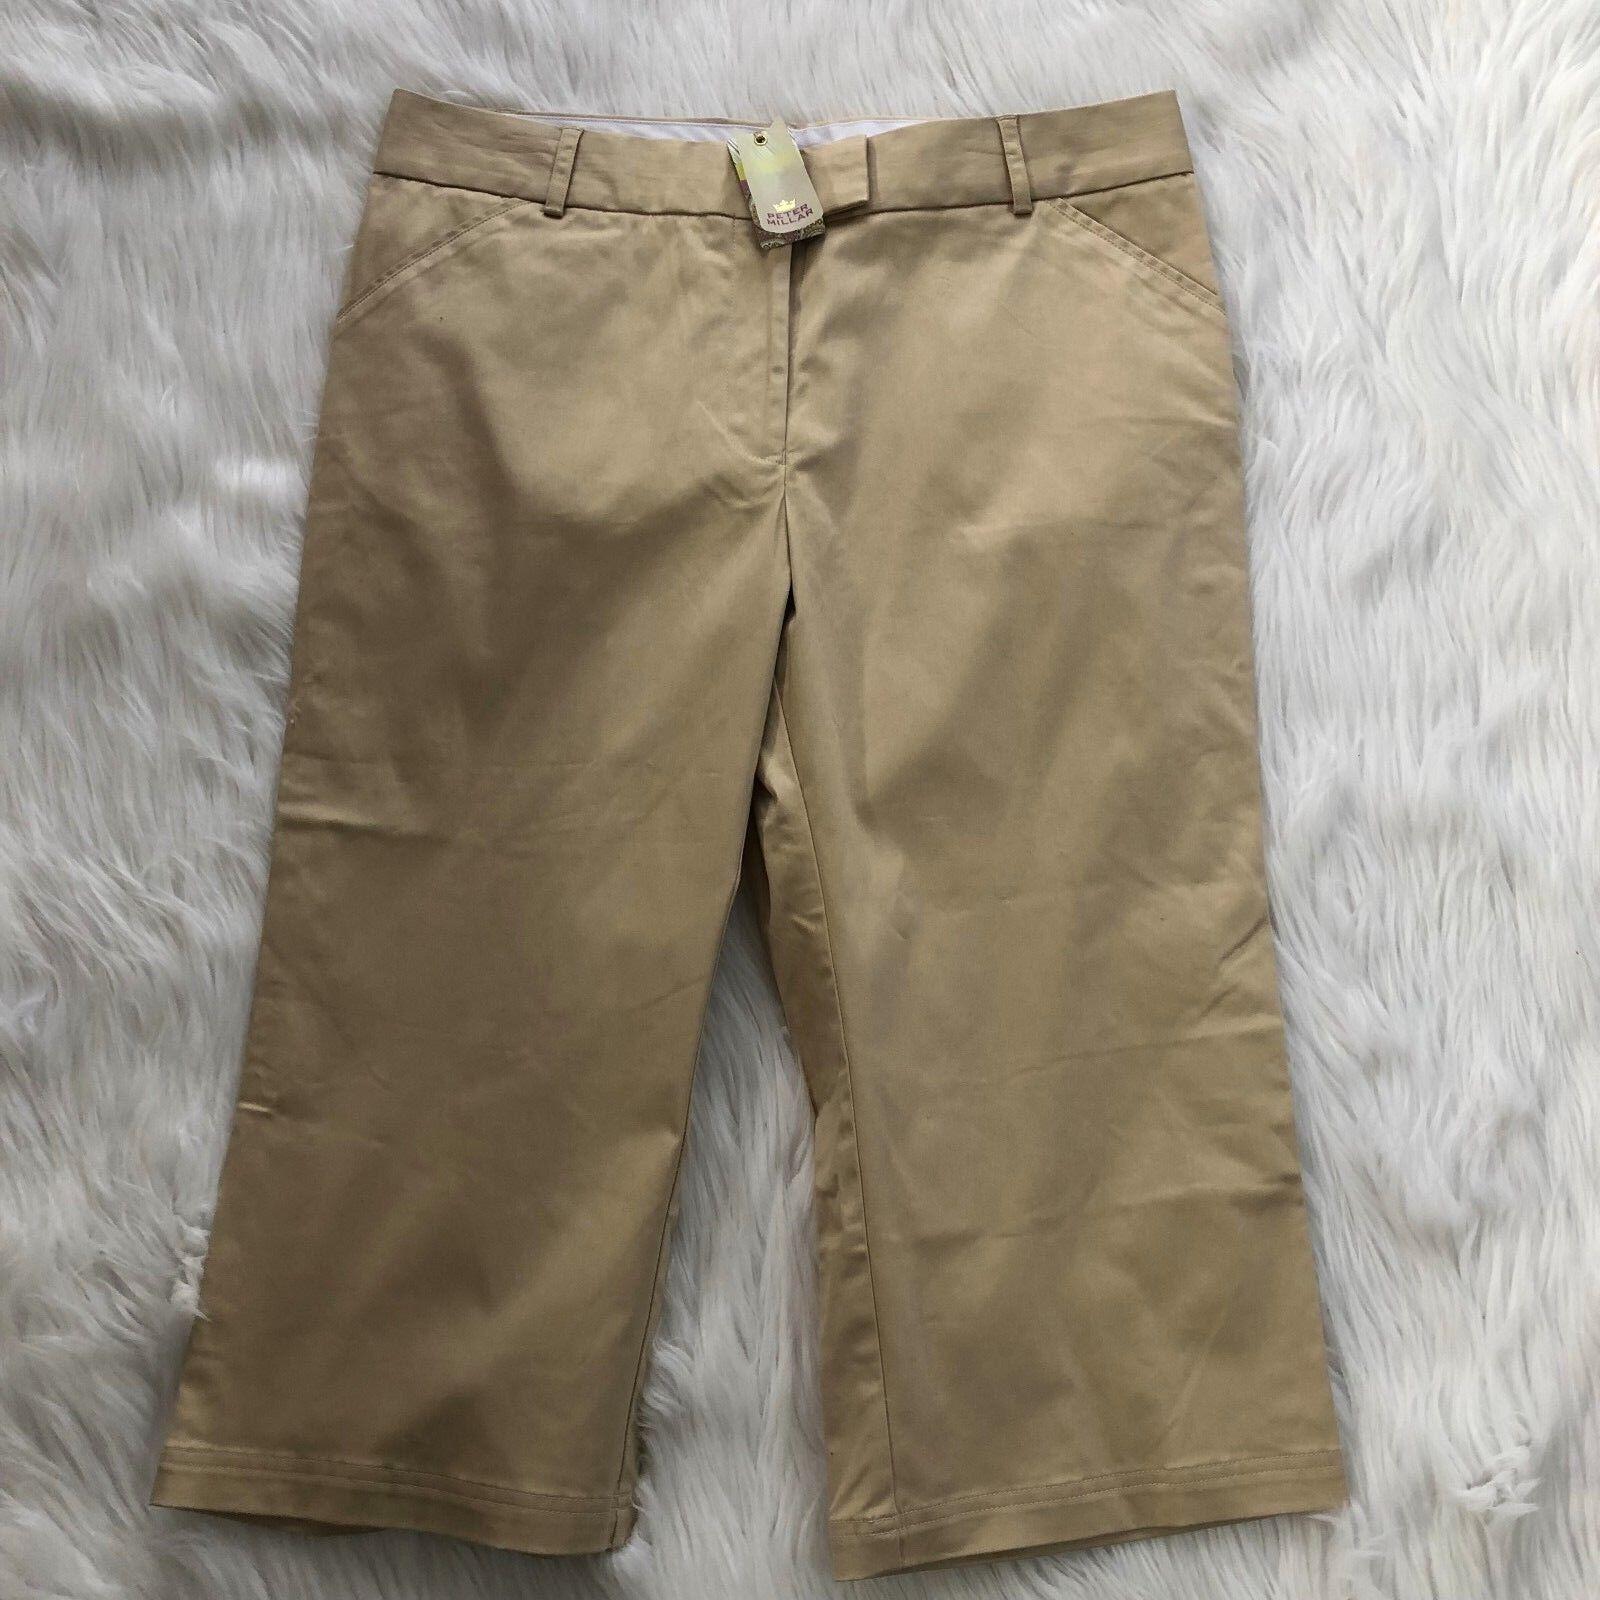 Peter Millar Womens Pants Cropped Khaki Beige Stretch Cotton Size 16 NEW  119